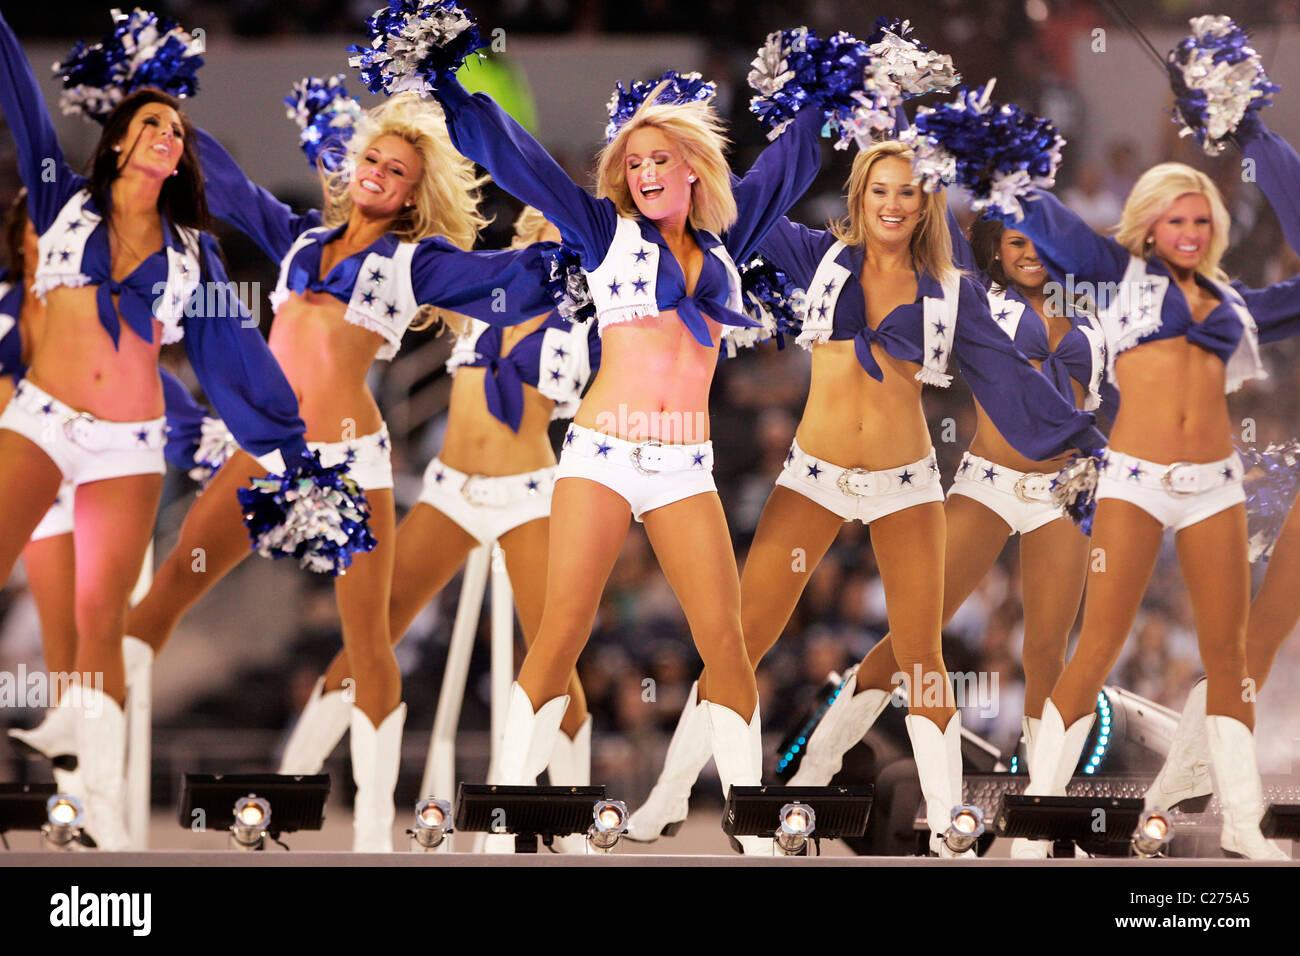 bb73ffcb6 Dallas Cowboys Cheerleaders Dallas Cowboys v Oakland Raiders held at the  Cowboy s Stadium The Dallas Cowboys